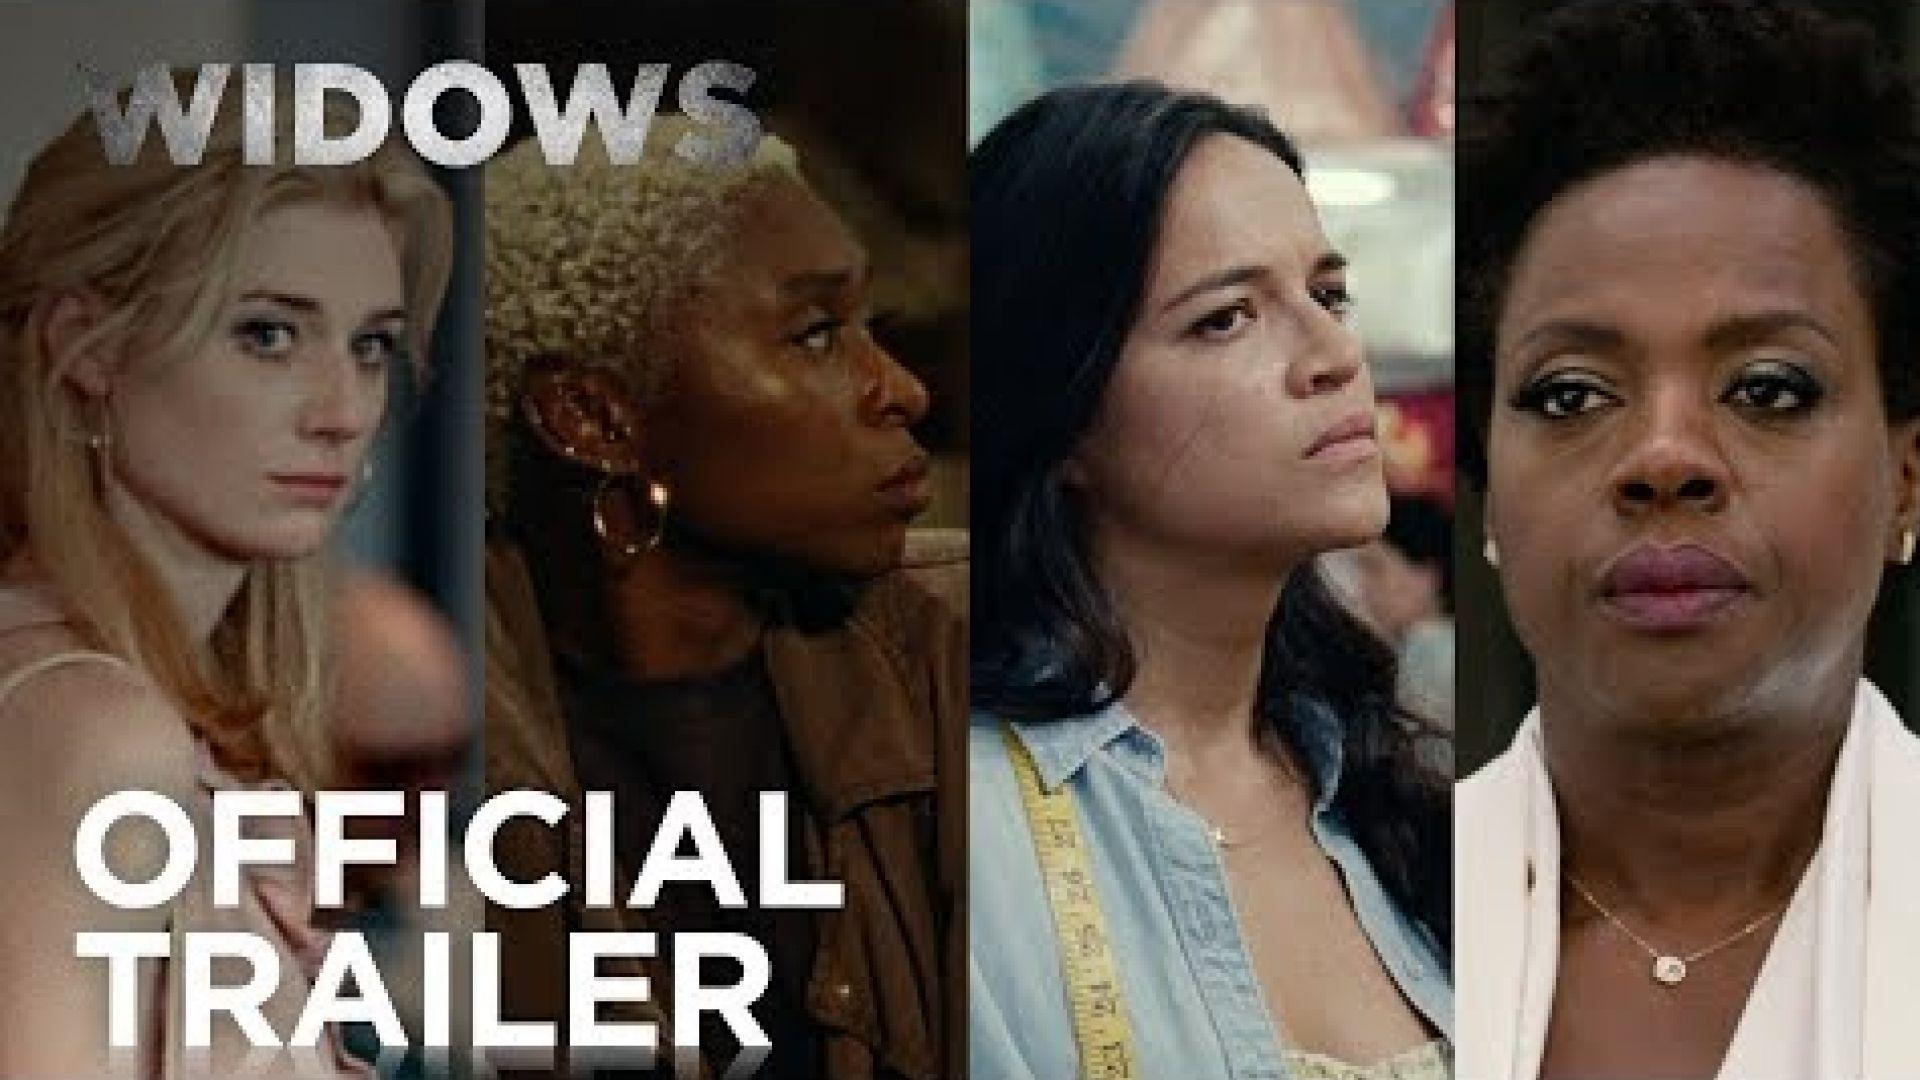 'Widows' Trailer 20th Century Fox